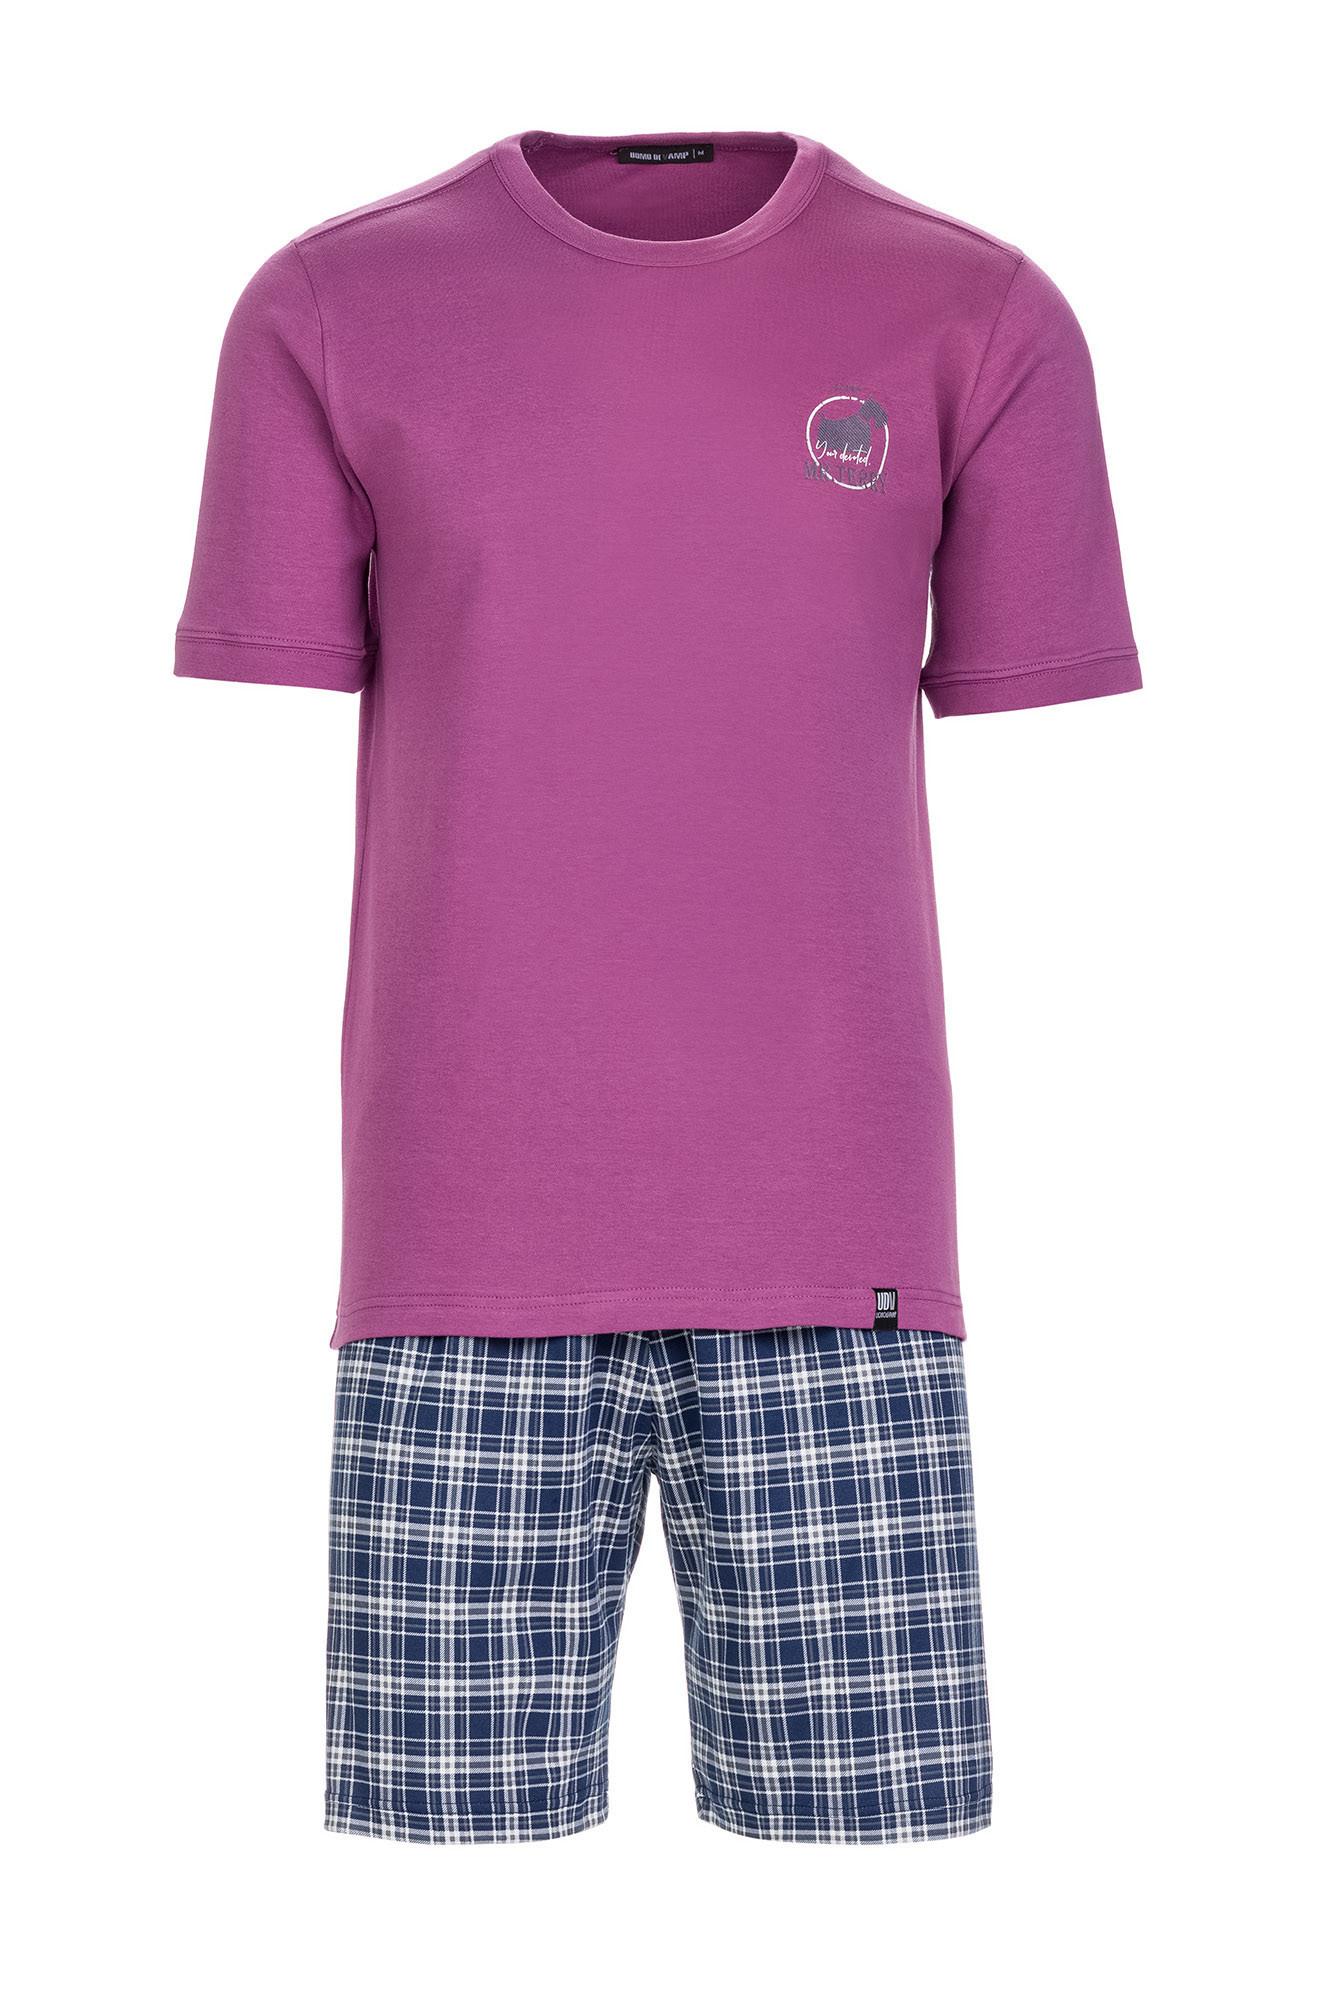 Vamp - Pánske pohodlné pyžamo 13702 - Vamp purple royal xxl